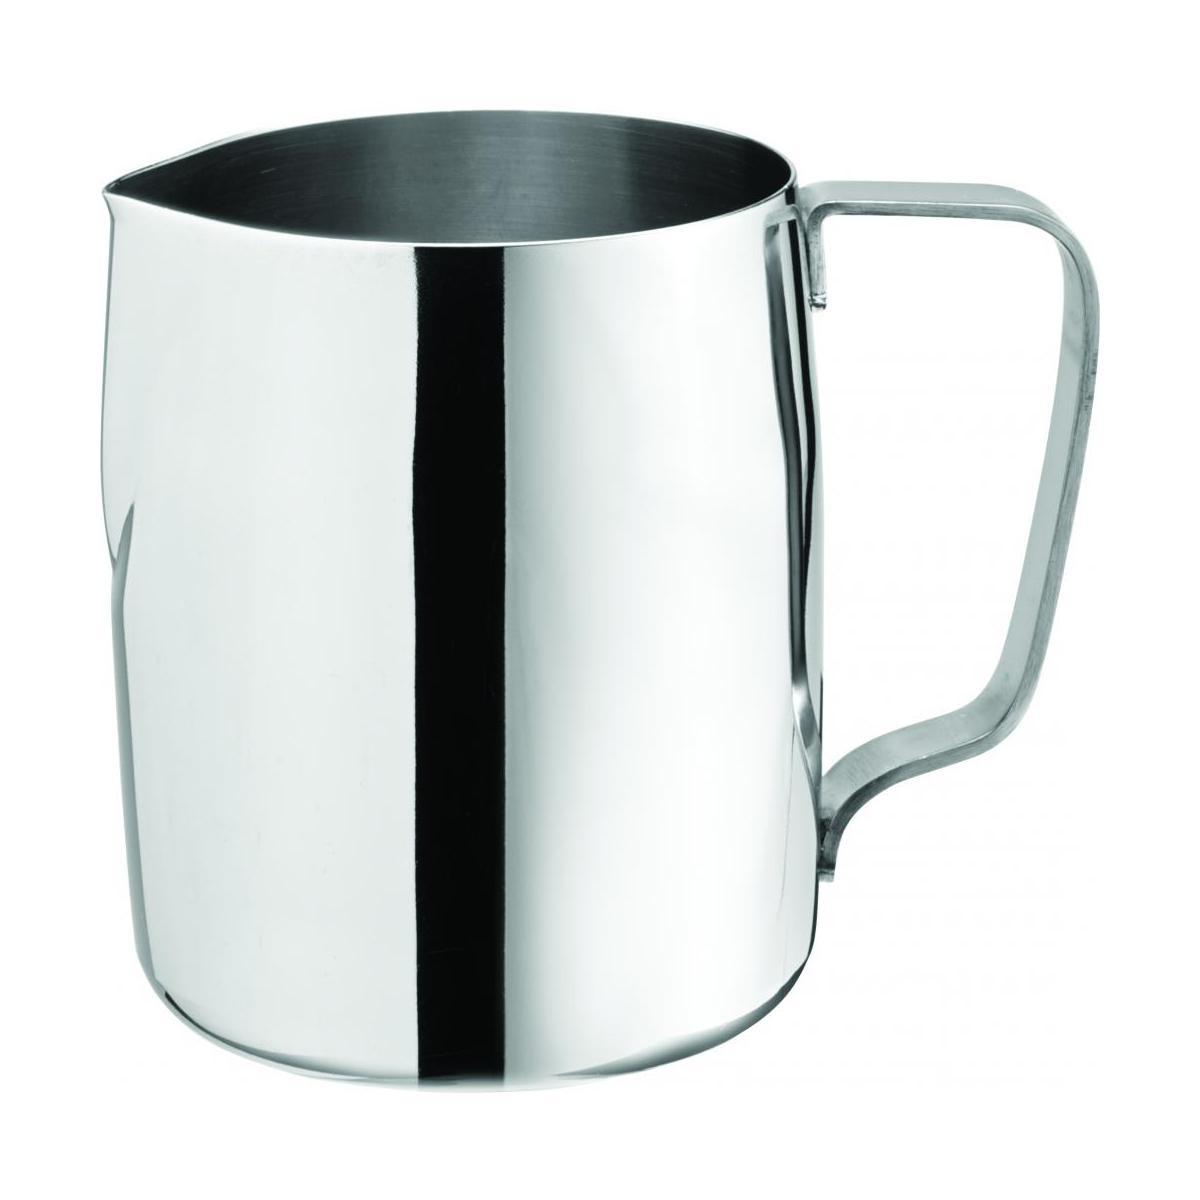 stainless steel milk frothing jug 14oz 41cl noble express. Black Bedroom Furniture Sets. Home Design Ideas